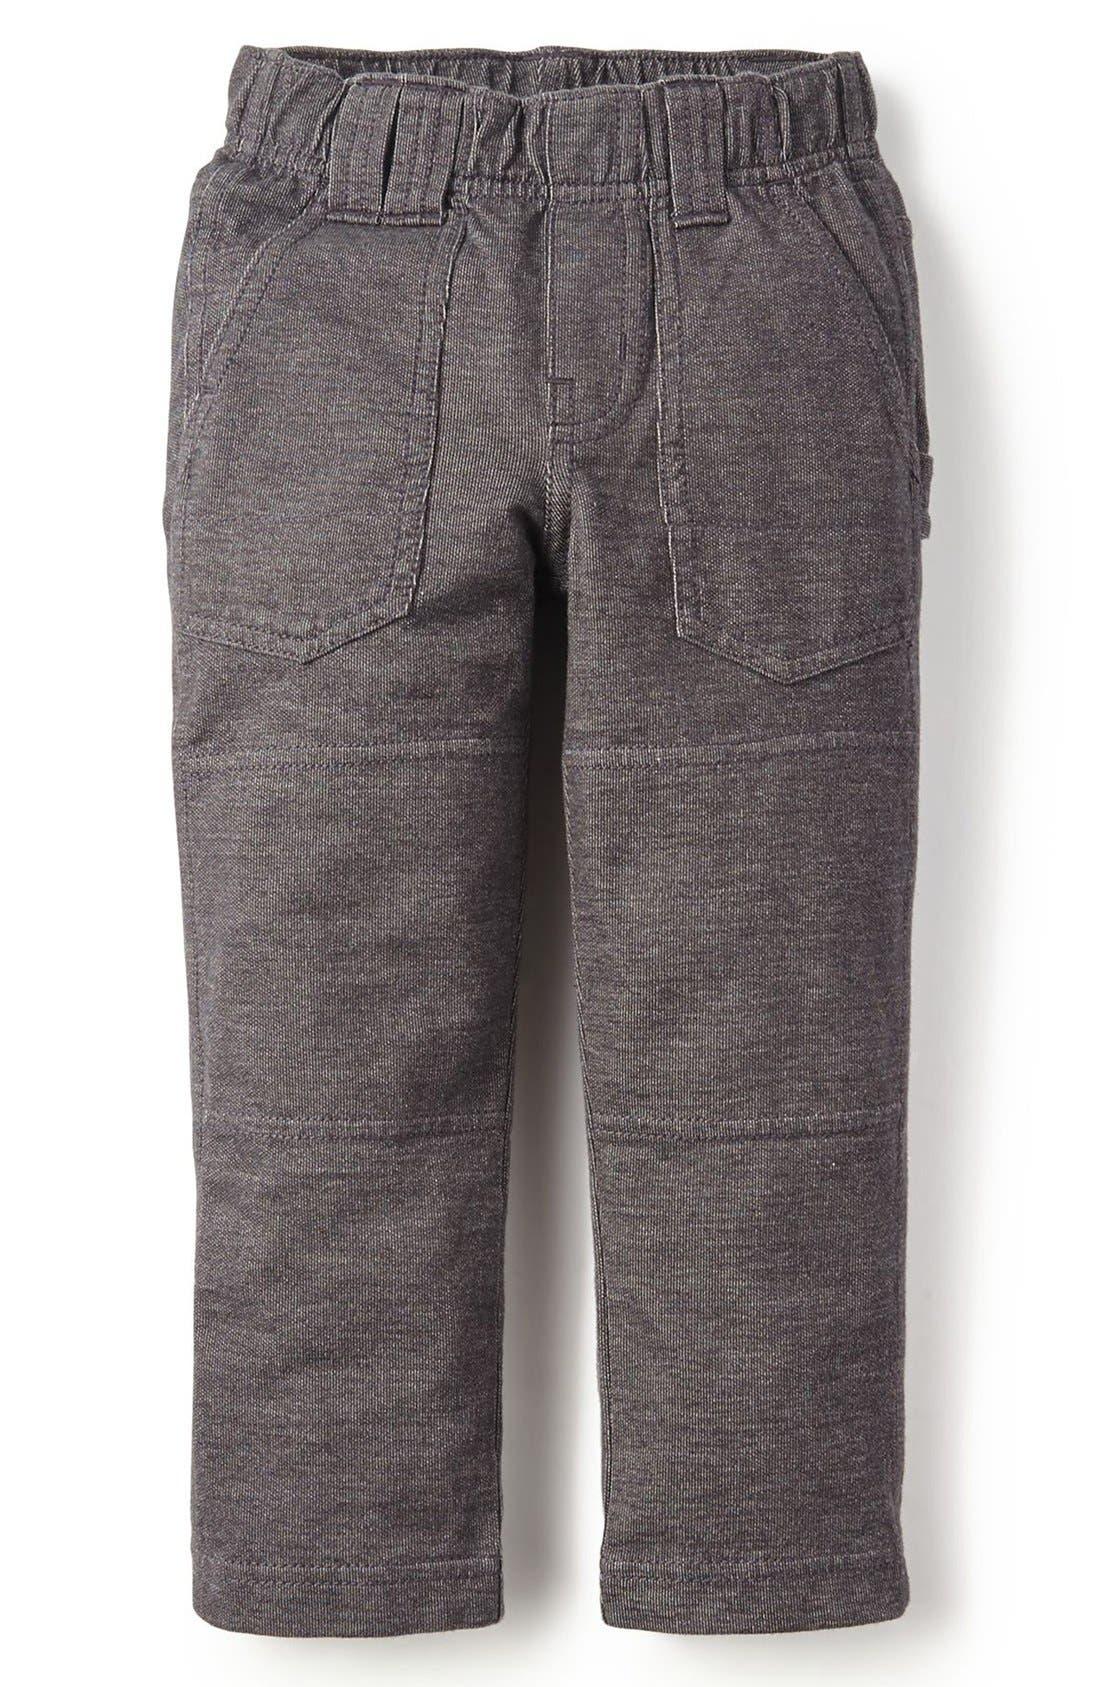 'Playwear' Pants,                         Main,                         color, 020